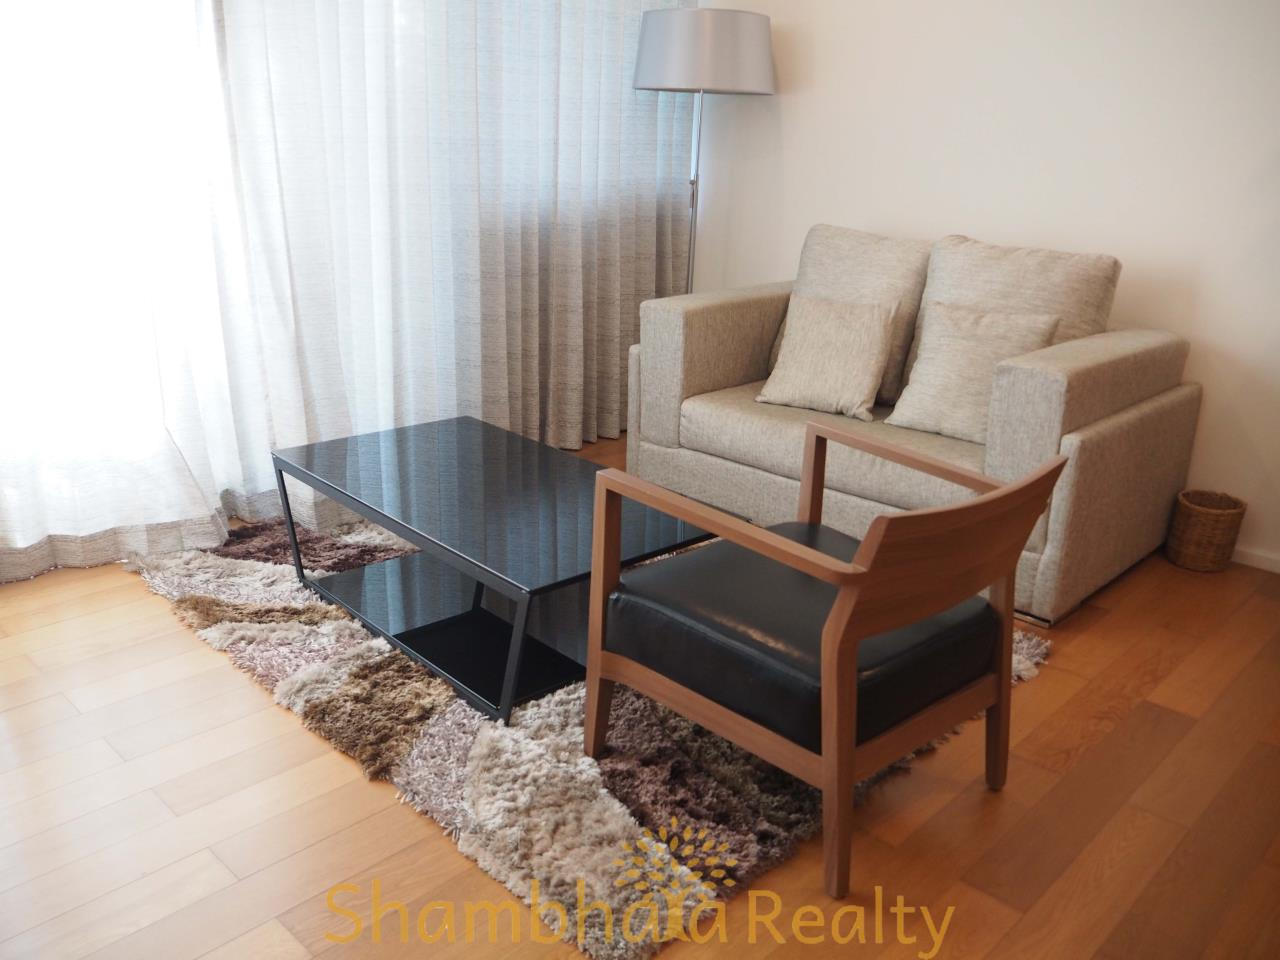 Shambhala Realty Agency's Wind Sukhumvit 23 Condominium for Rent in Sukhumvit 23 22